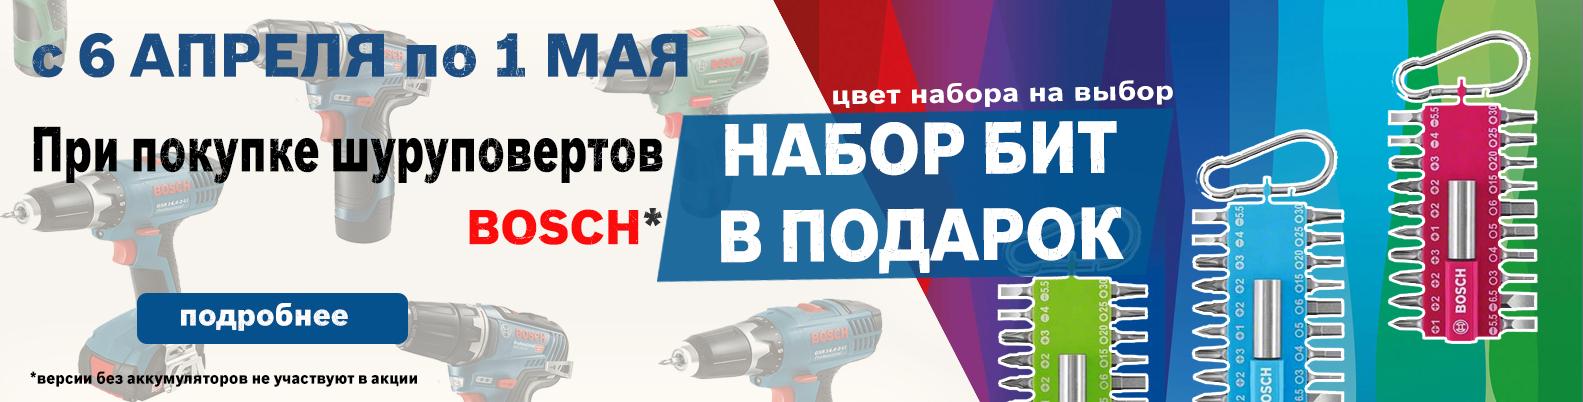 bosch_sale_2020_04_06__